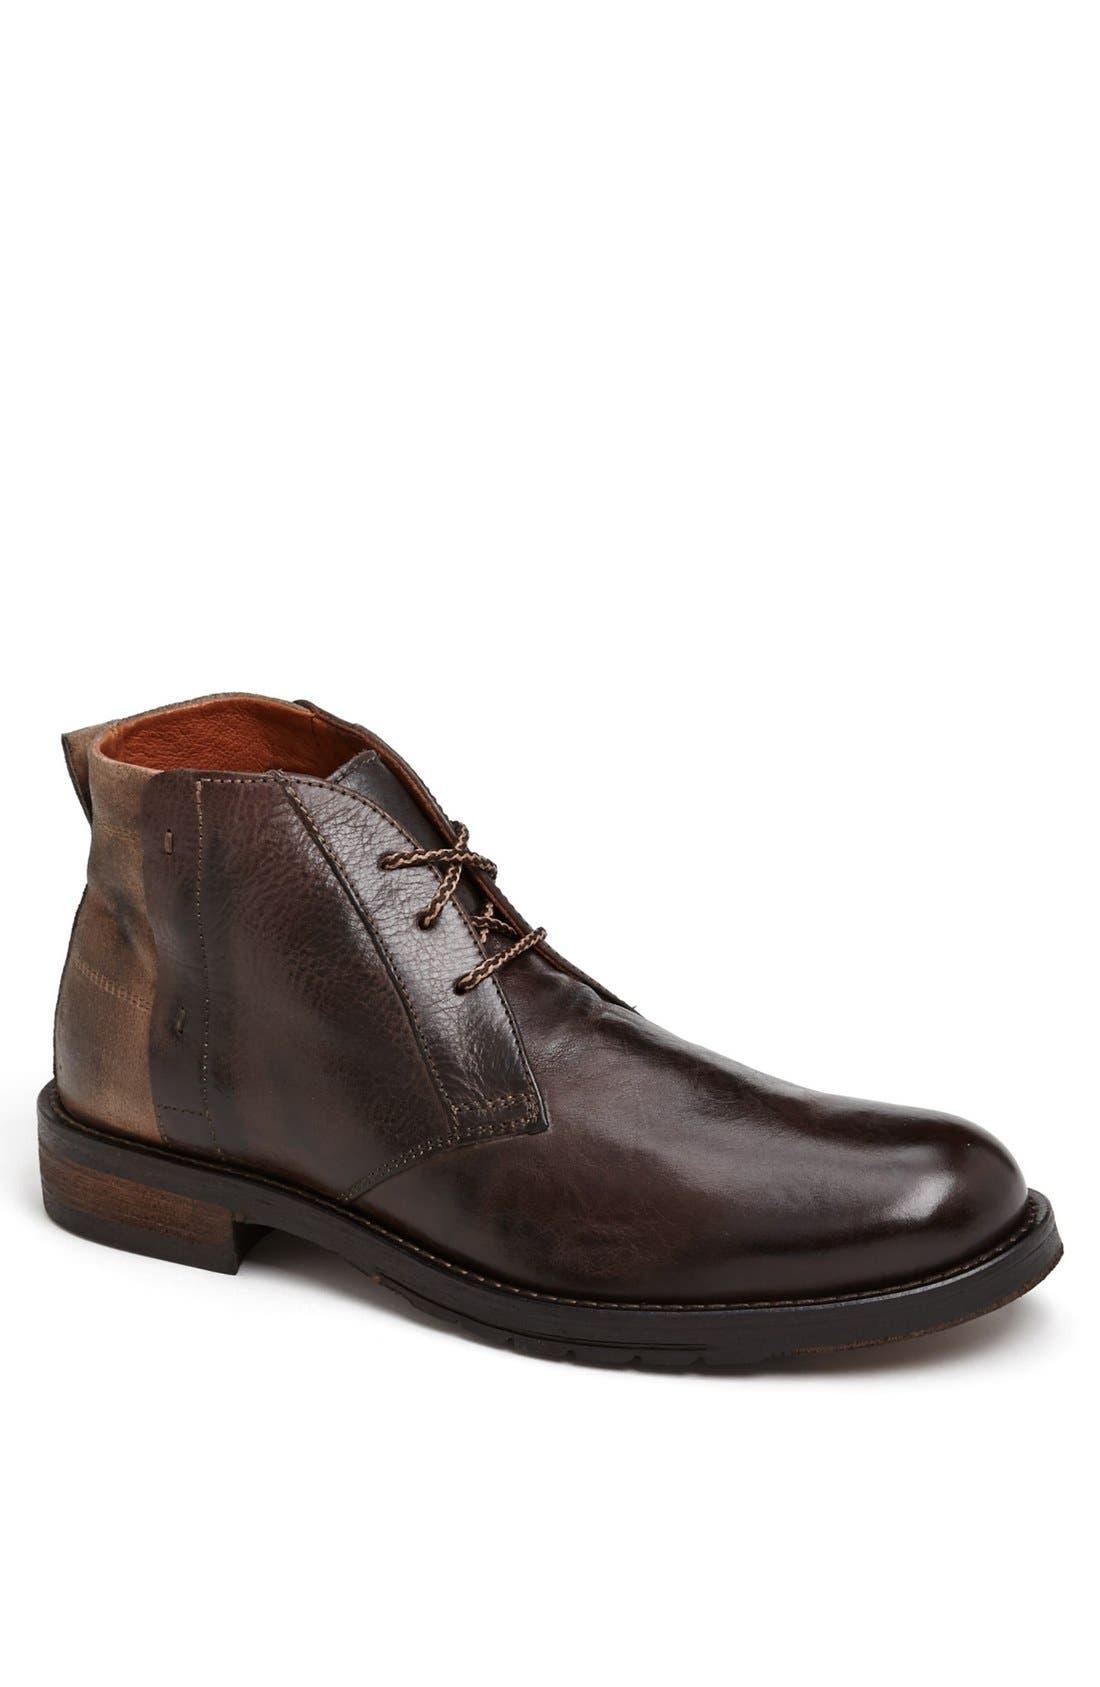 Main Image - J&M 1850 'Nordeman' Chukka Boot (Online Only)